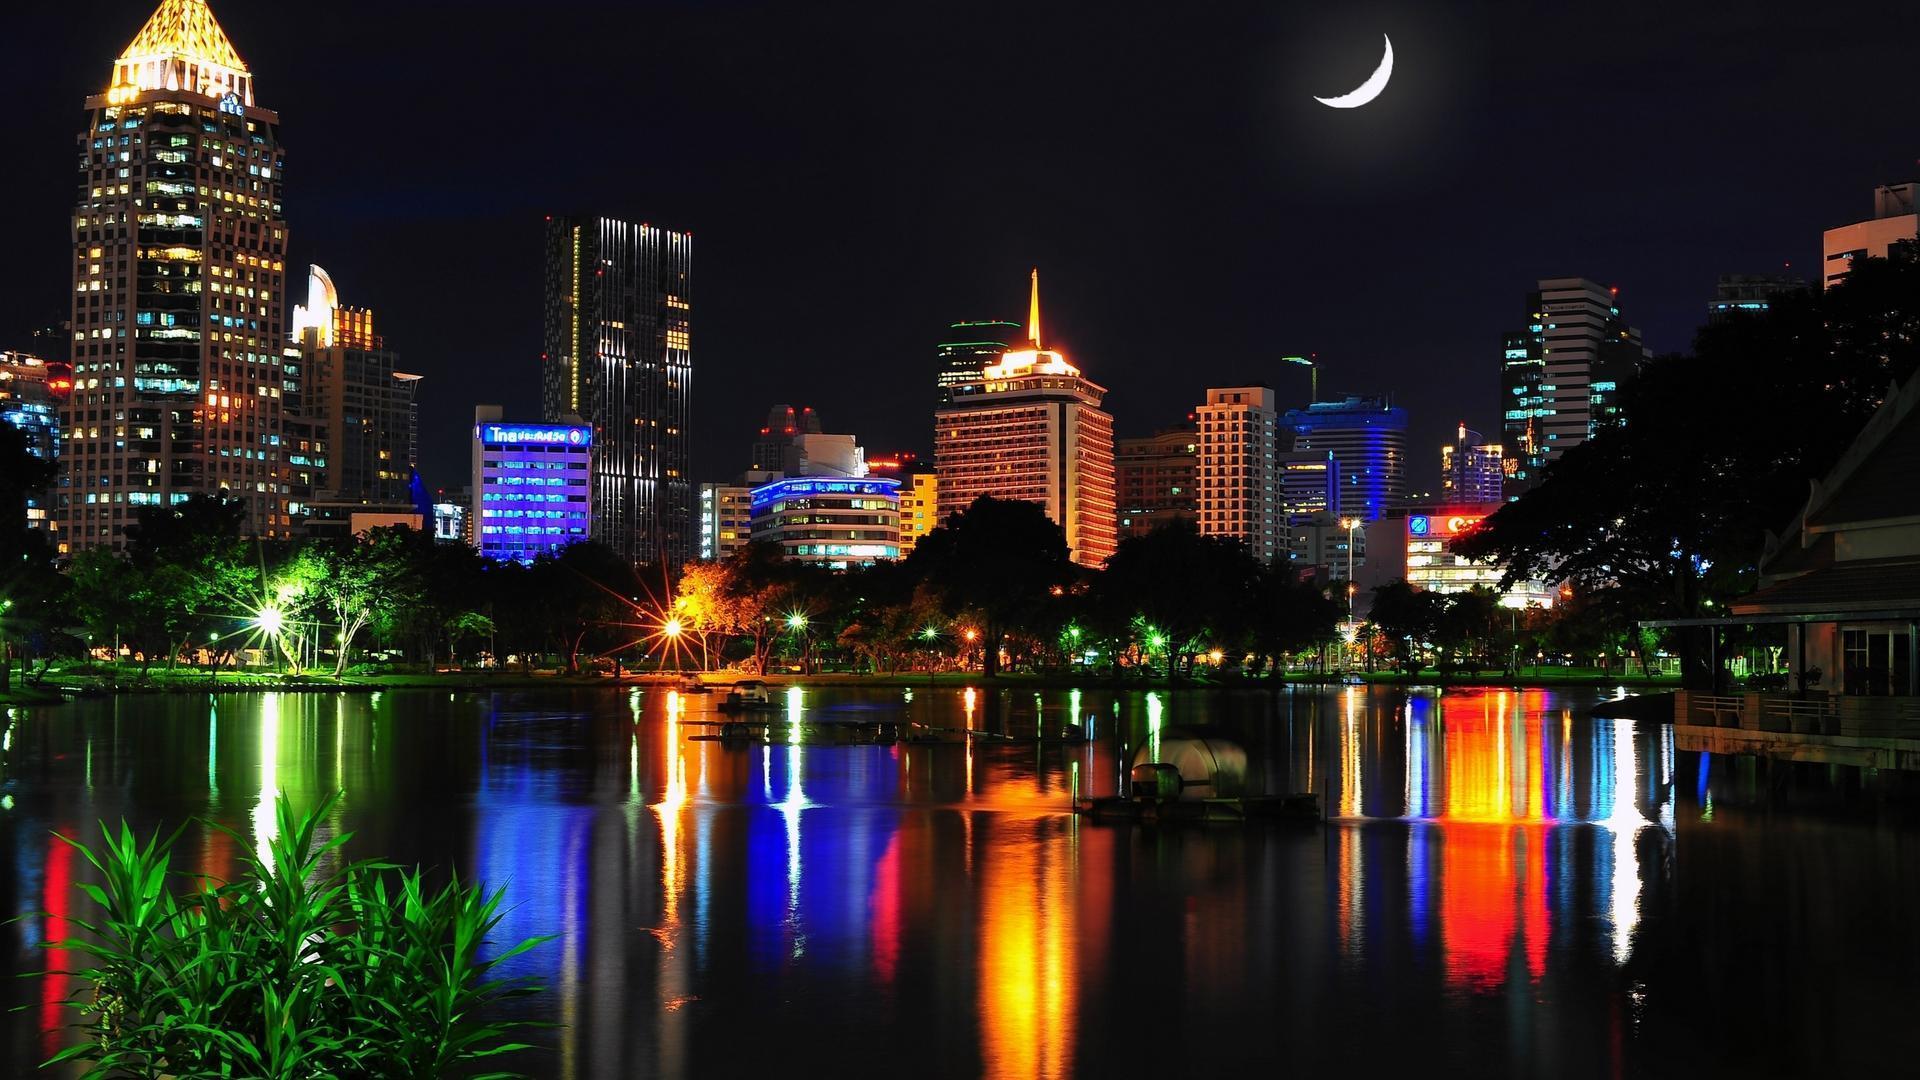 страны архитектура Бангкок Таиланд ночь  № 2195052 загрузить